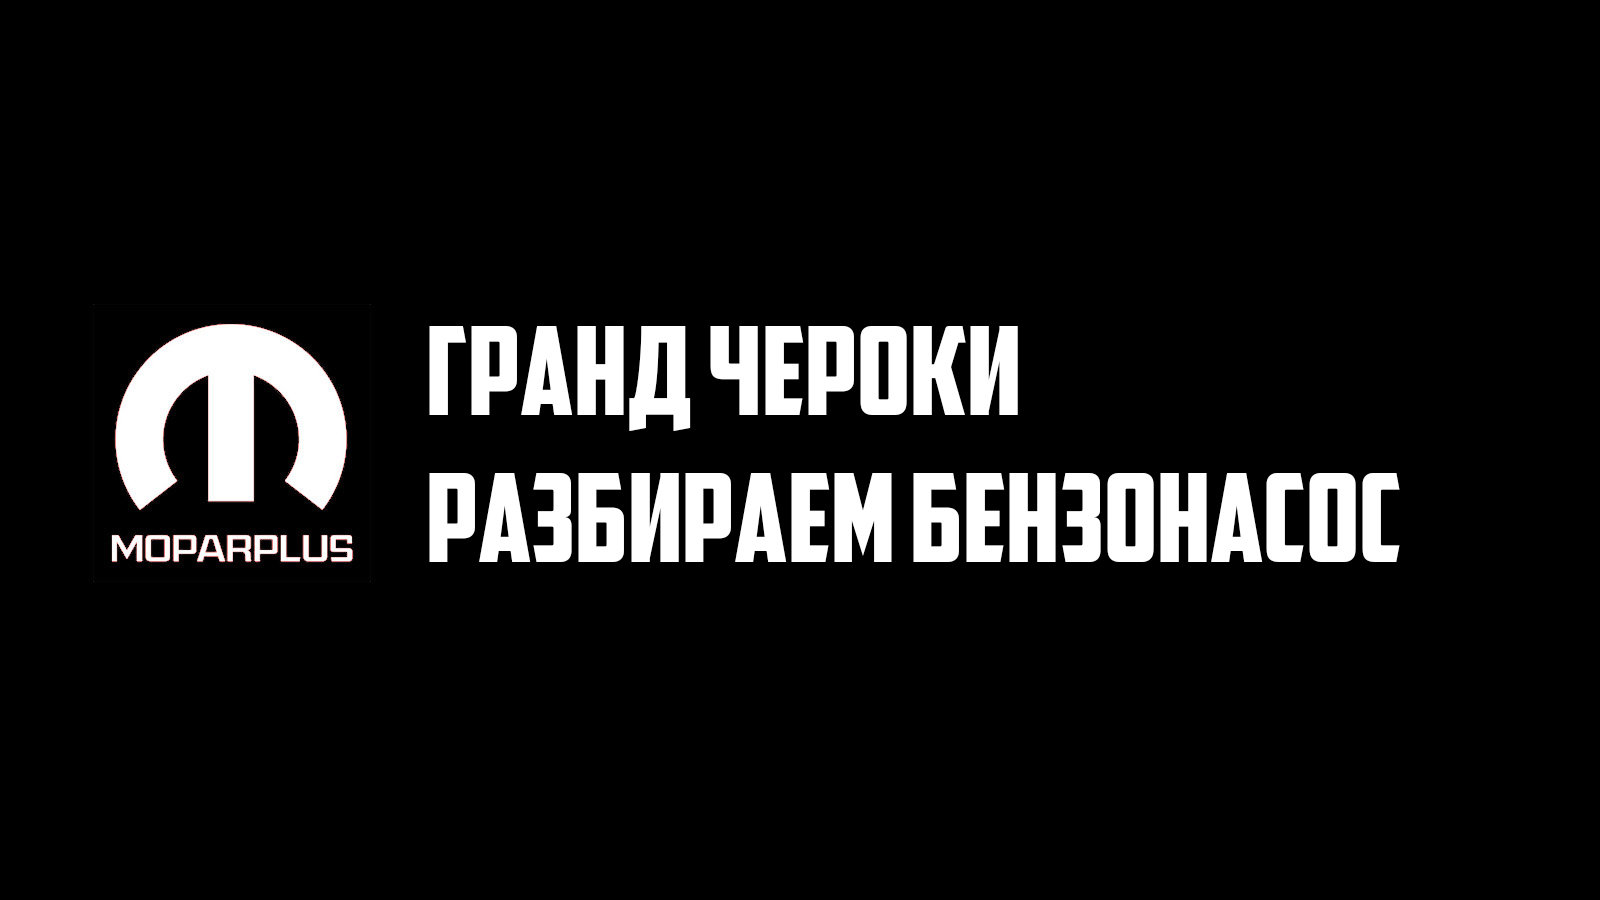 Бензонасос Гранд Чероки WK2